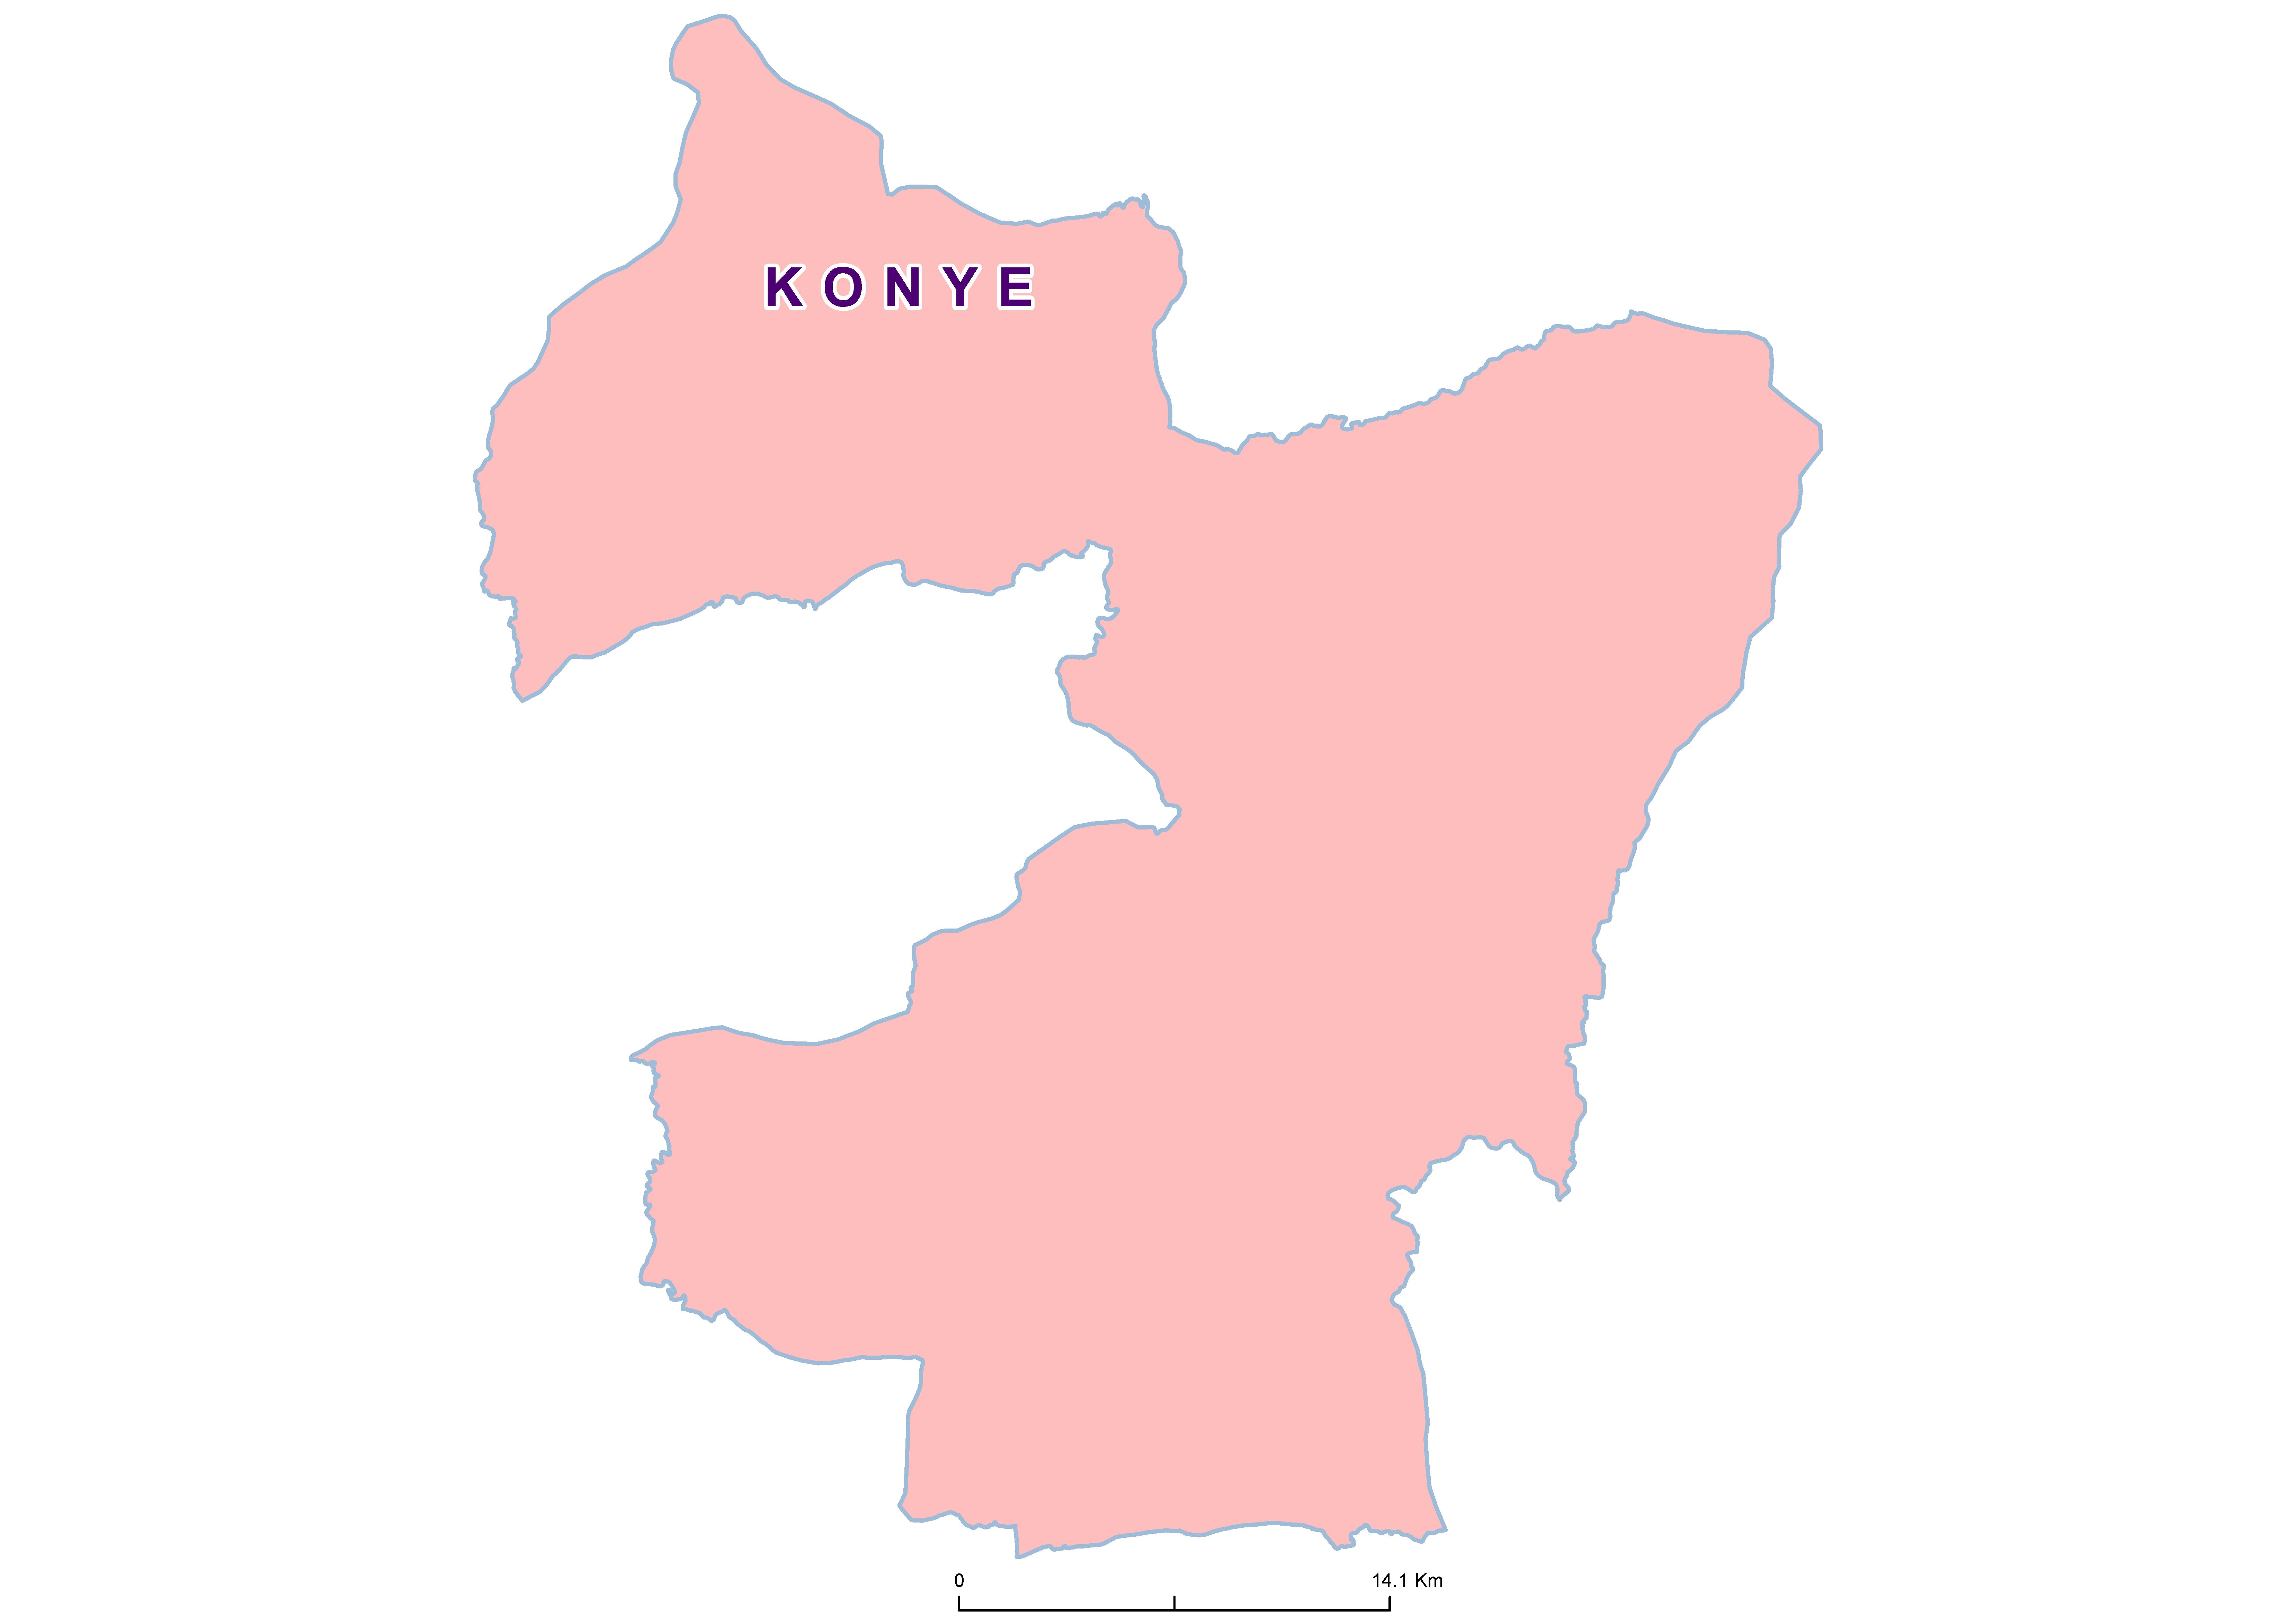 Konye Mean SCH 20100001